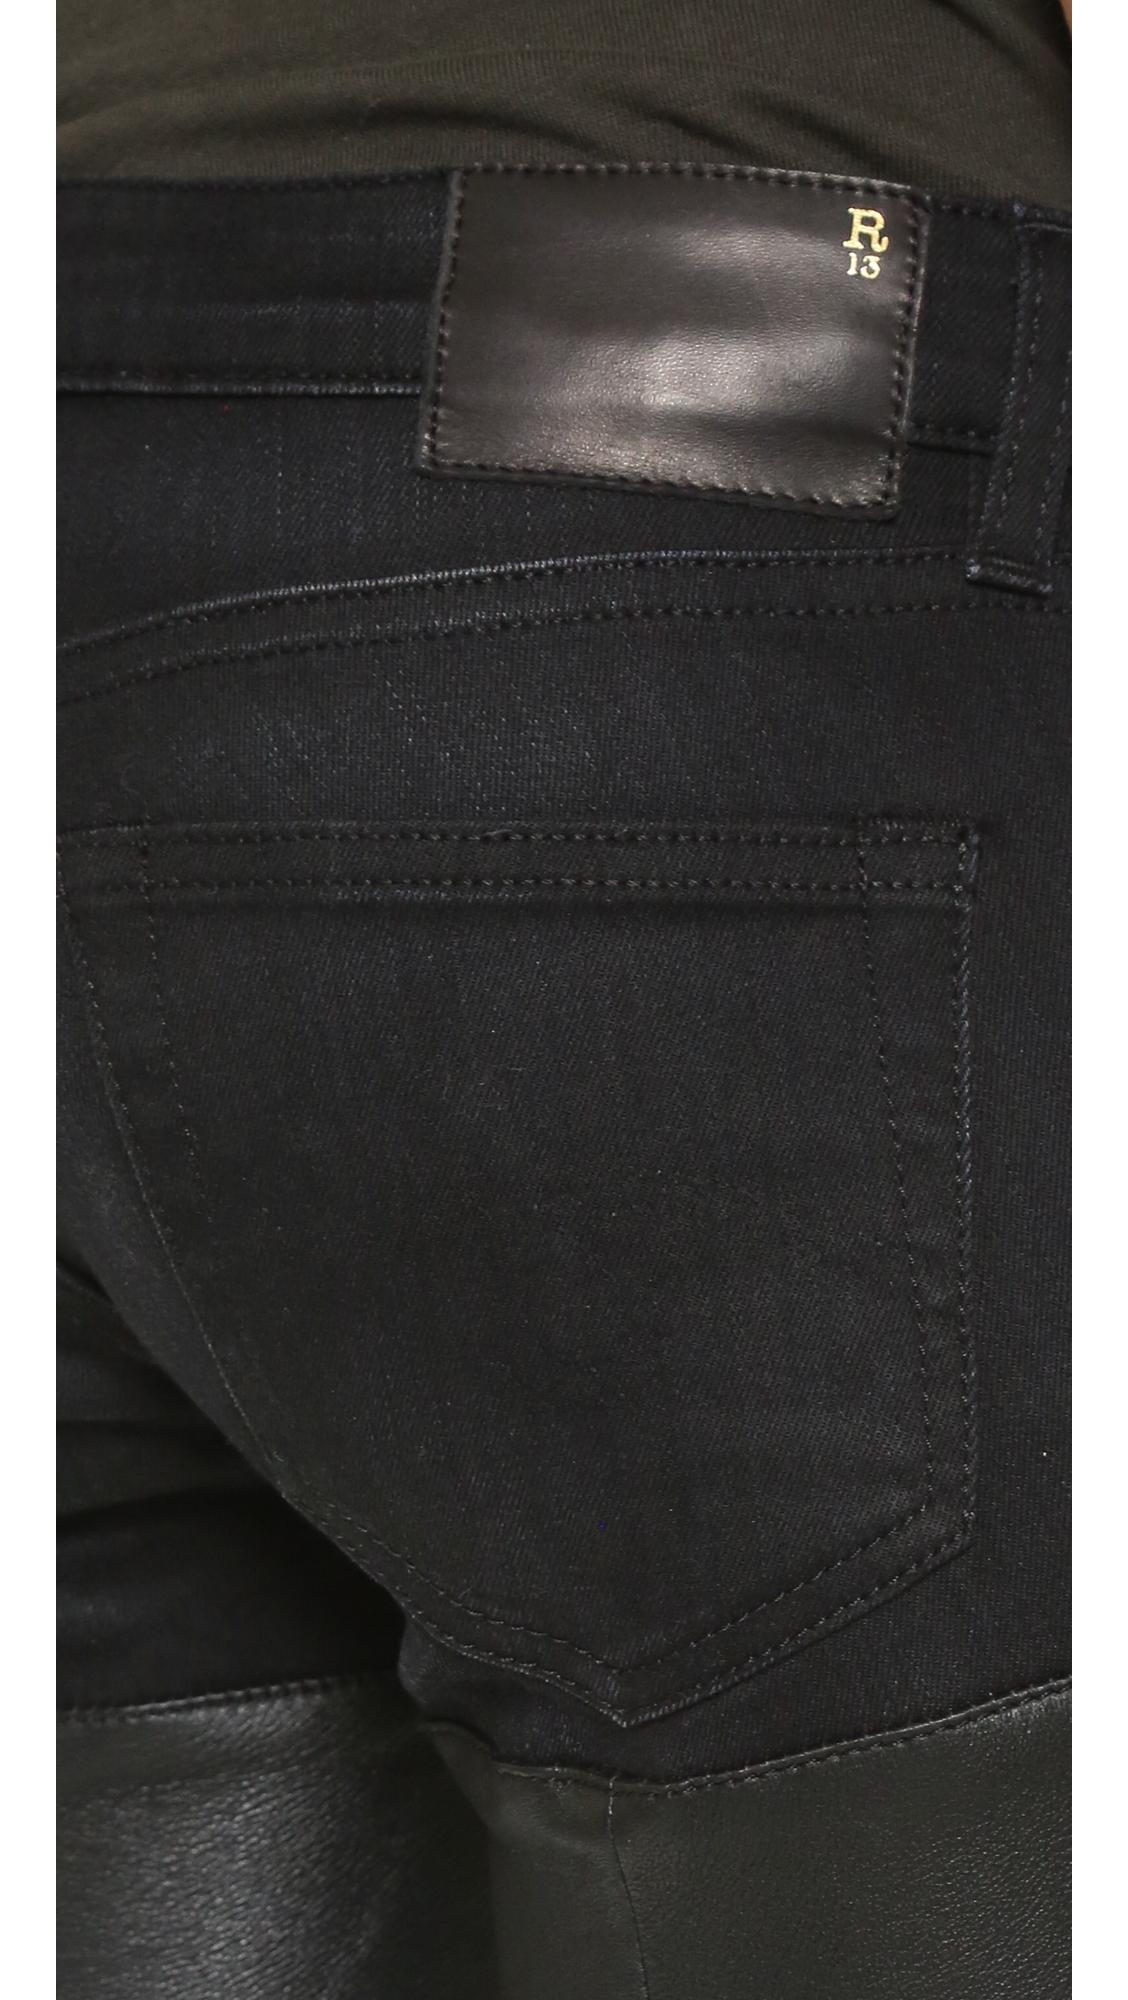 Кожаные джинсы Chaps R13  (RTHIR2028512867108)